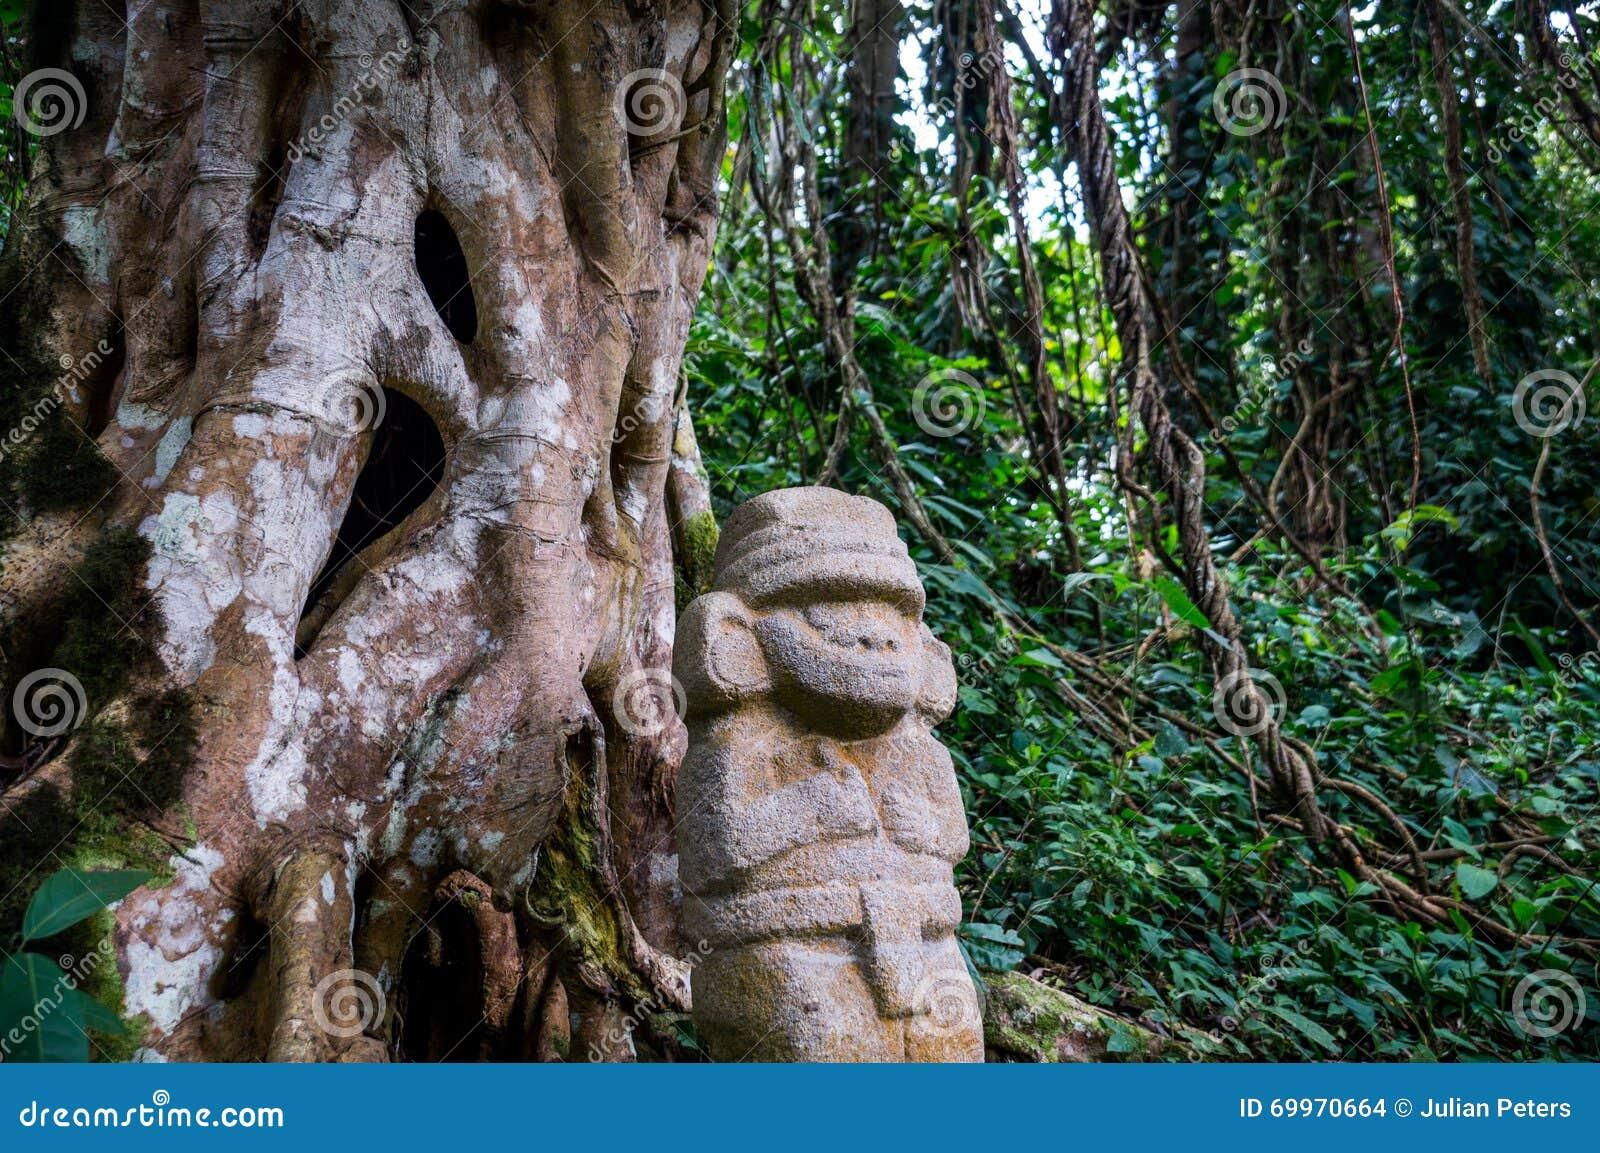 Standbeeld in het regenwoud in San Agustin